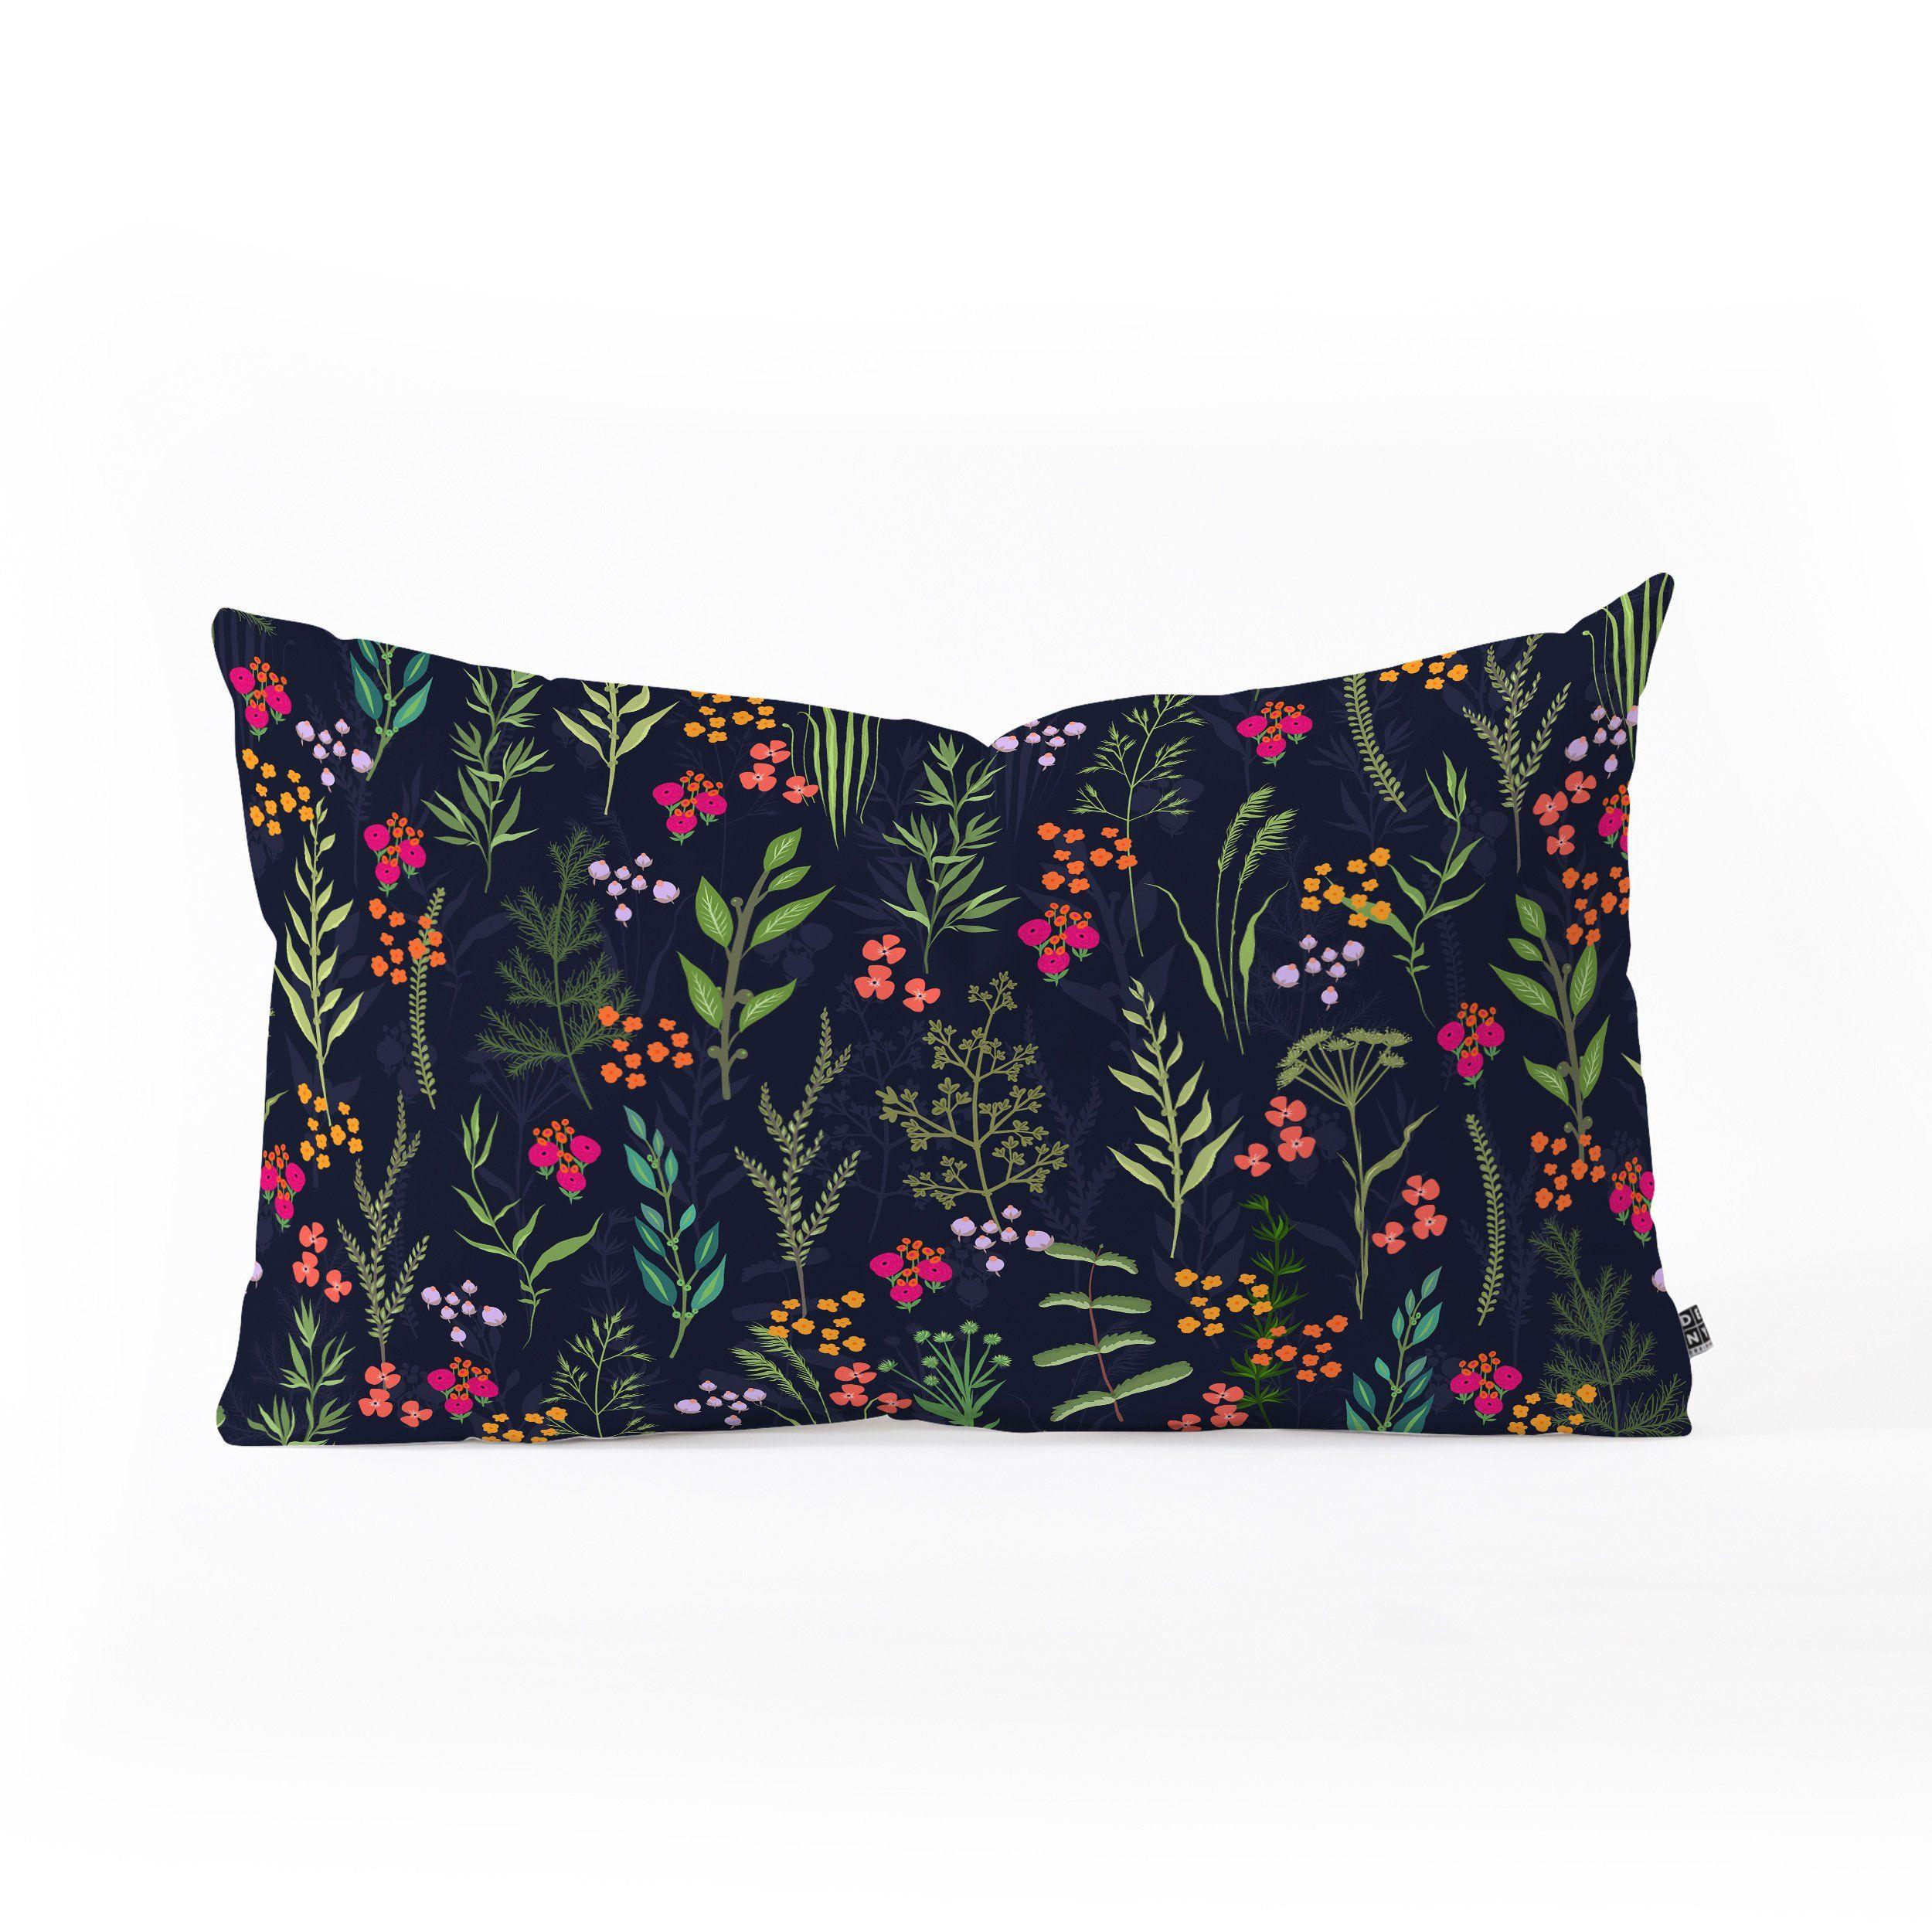 Margaux Oblong Throw Pillow Iveta Abolina Oblong Throw Pillow Throw Pillows Pillows